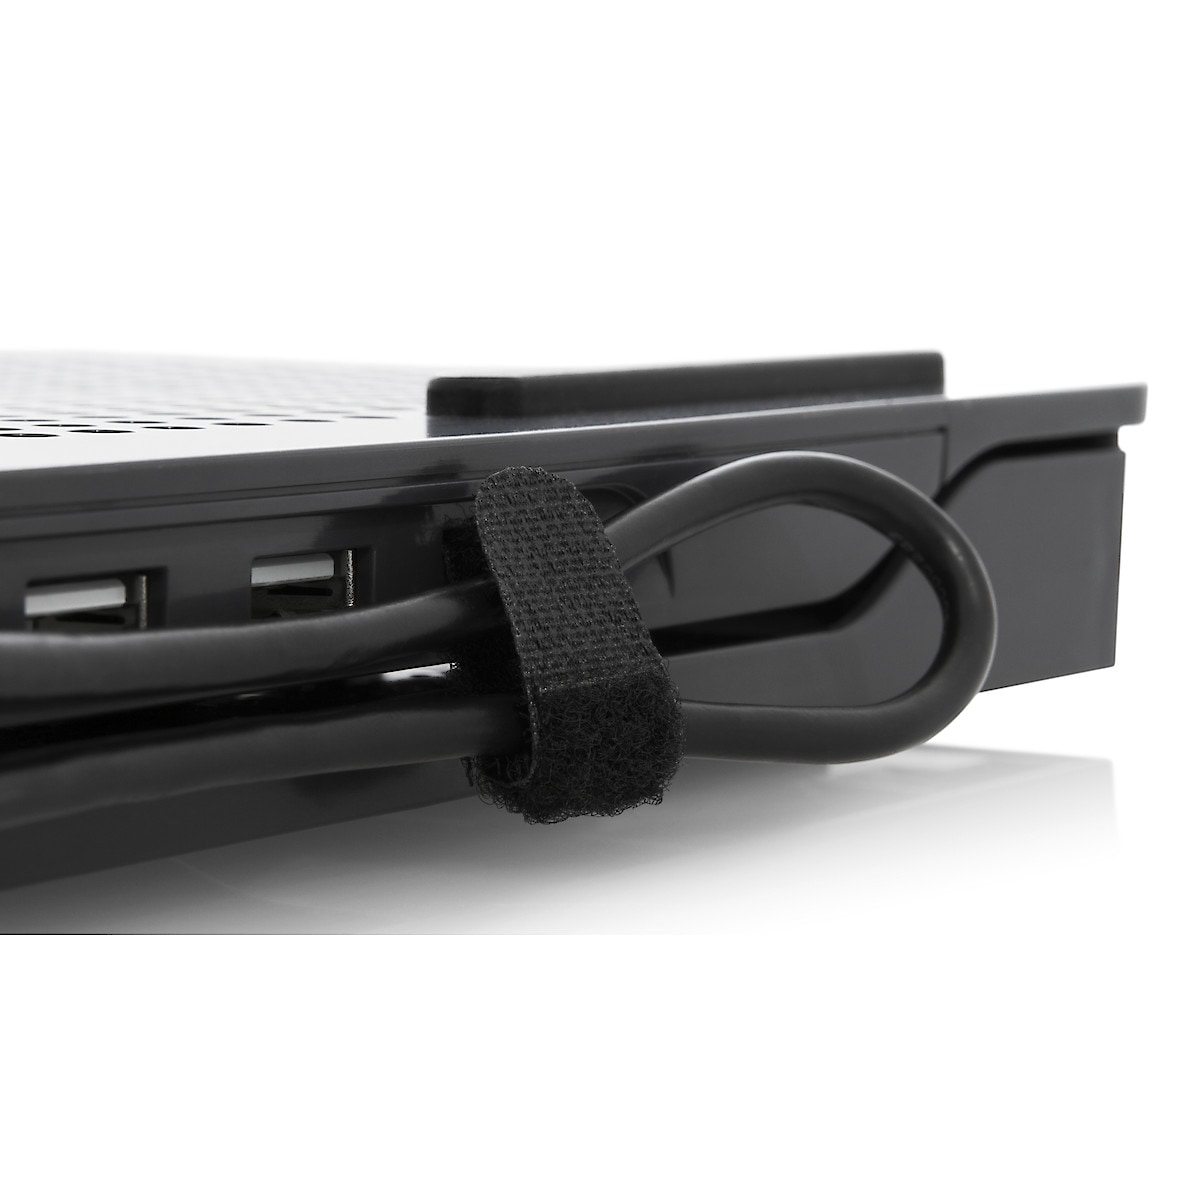 Laptophalterung mit USB-Hub, Targus Chill Mat Plus